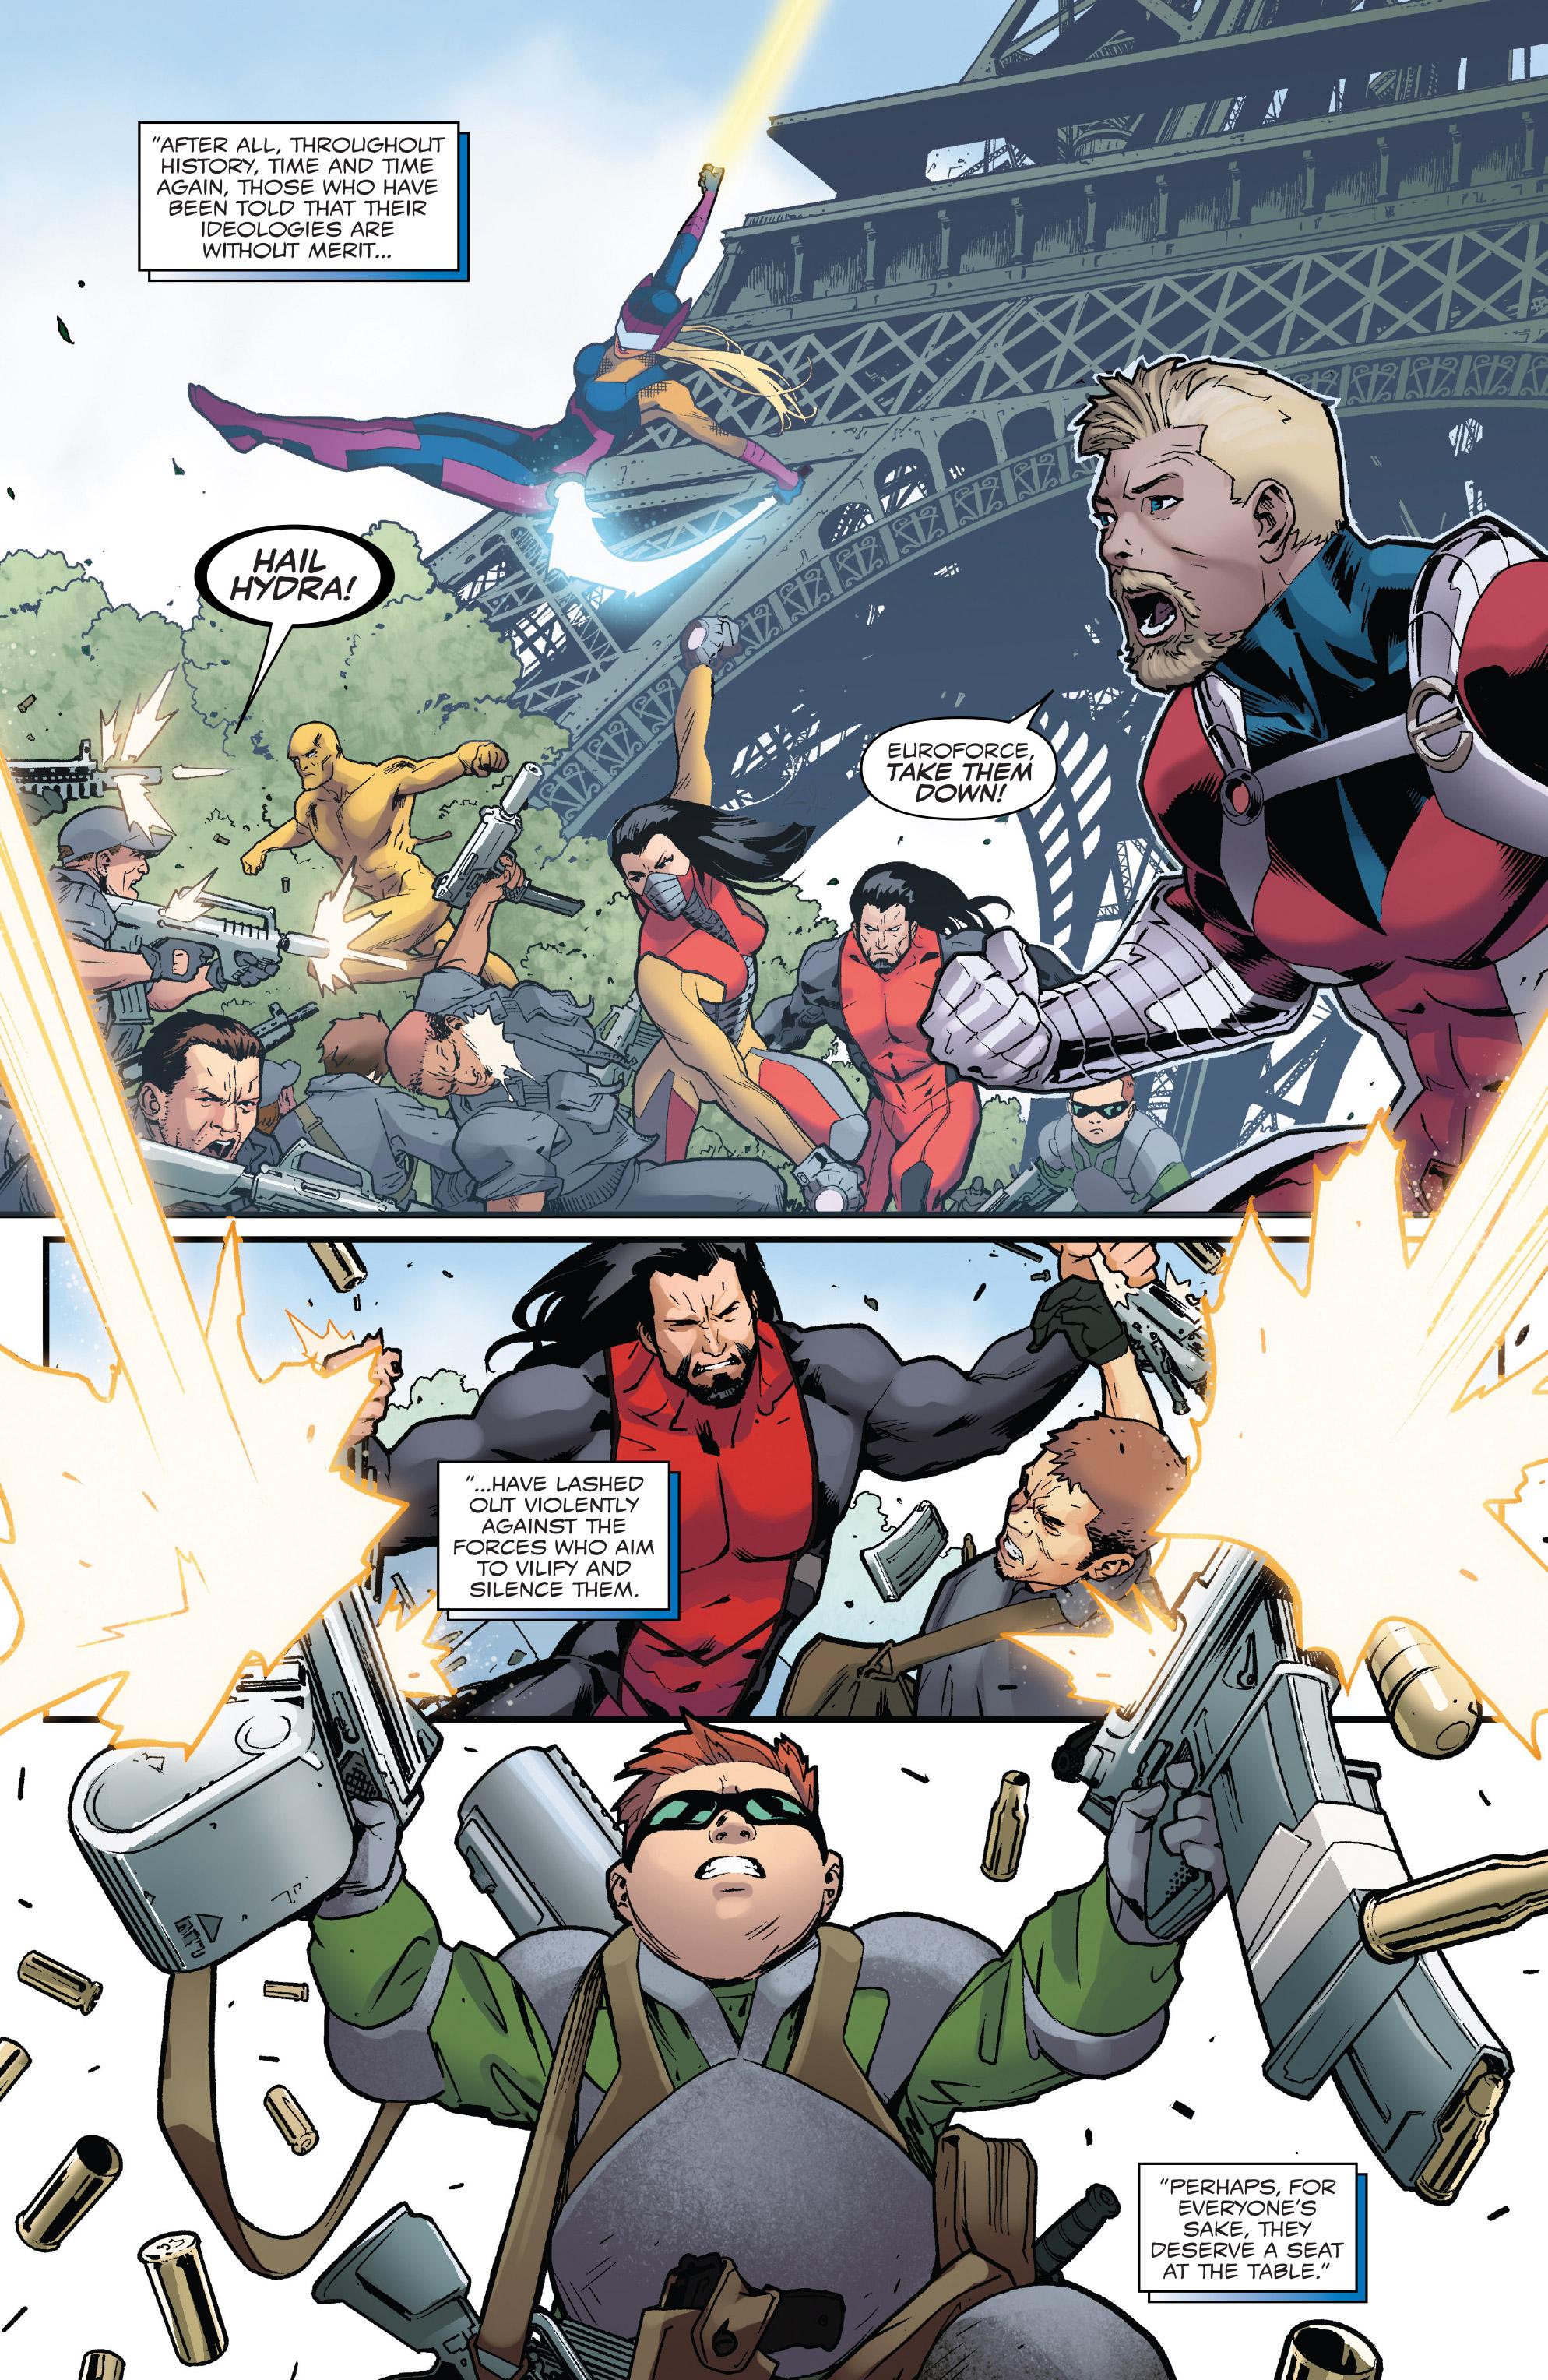 Read online Captain America: Steve Rogers comic -  Issue #18 - 13